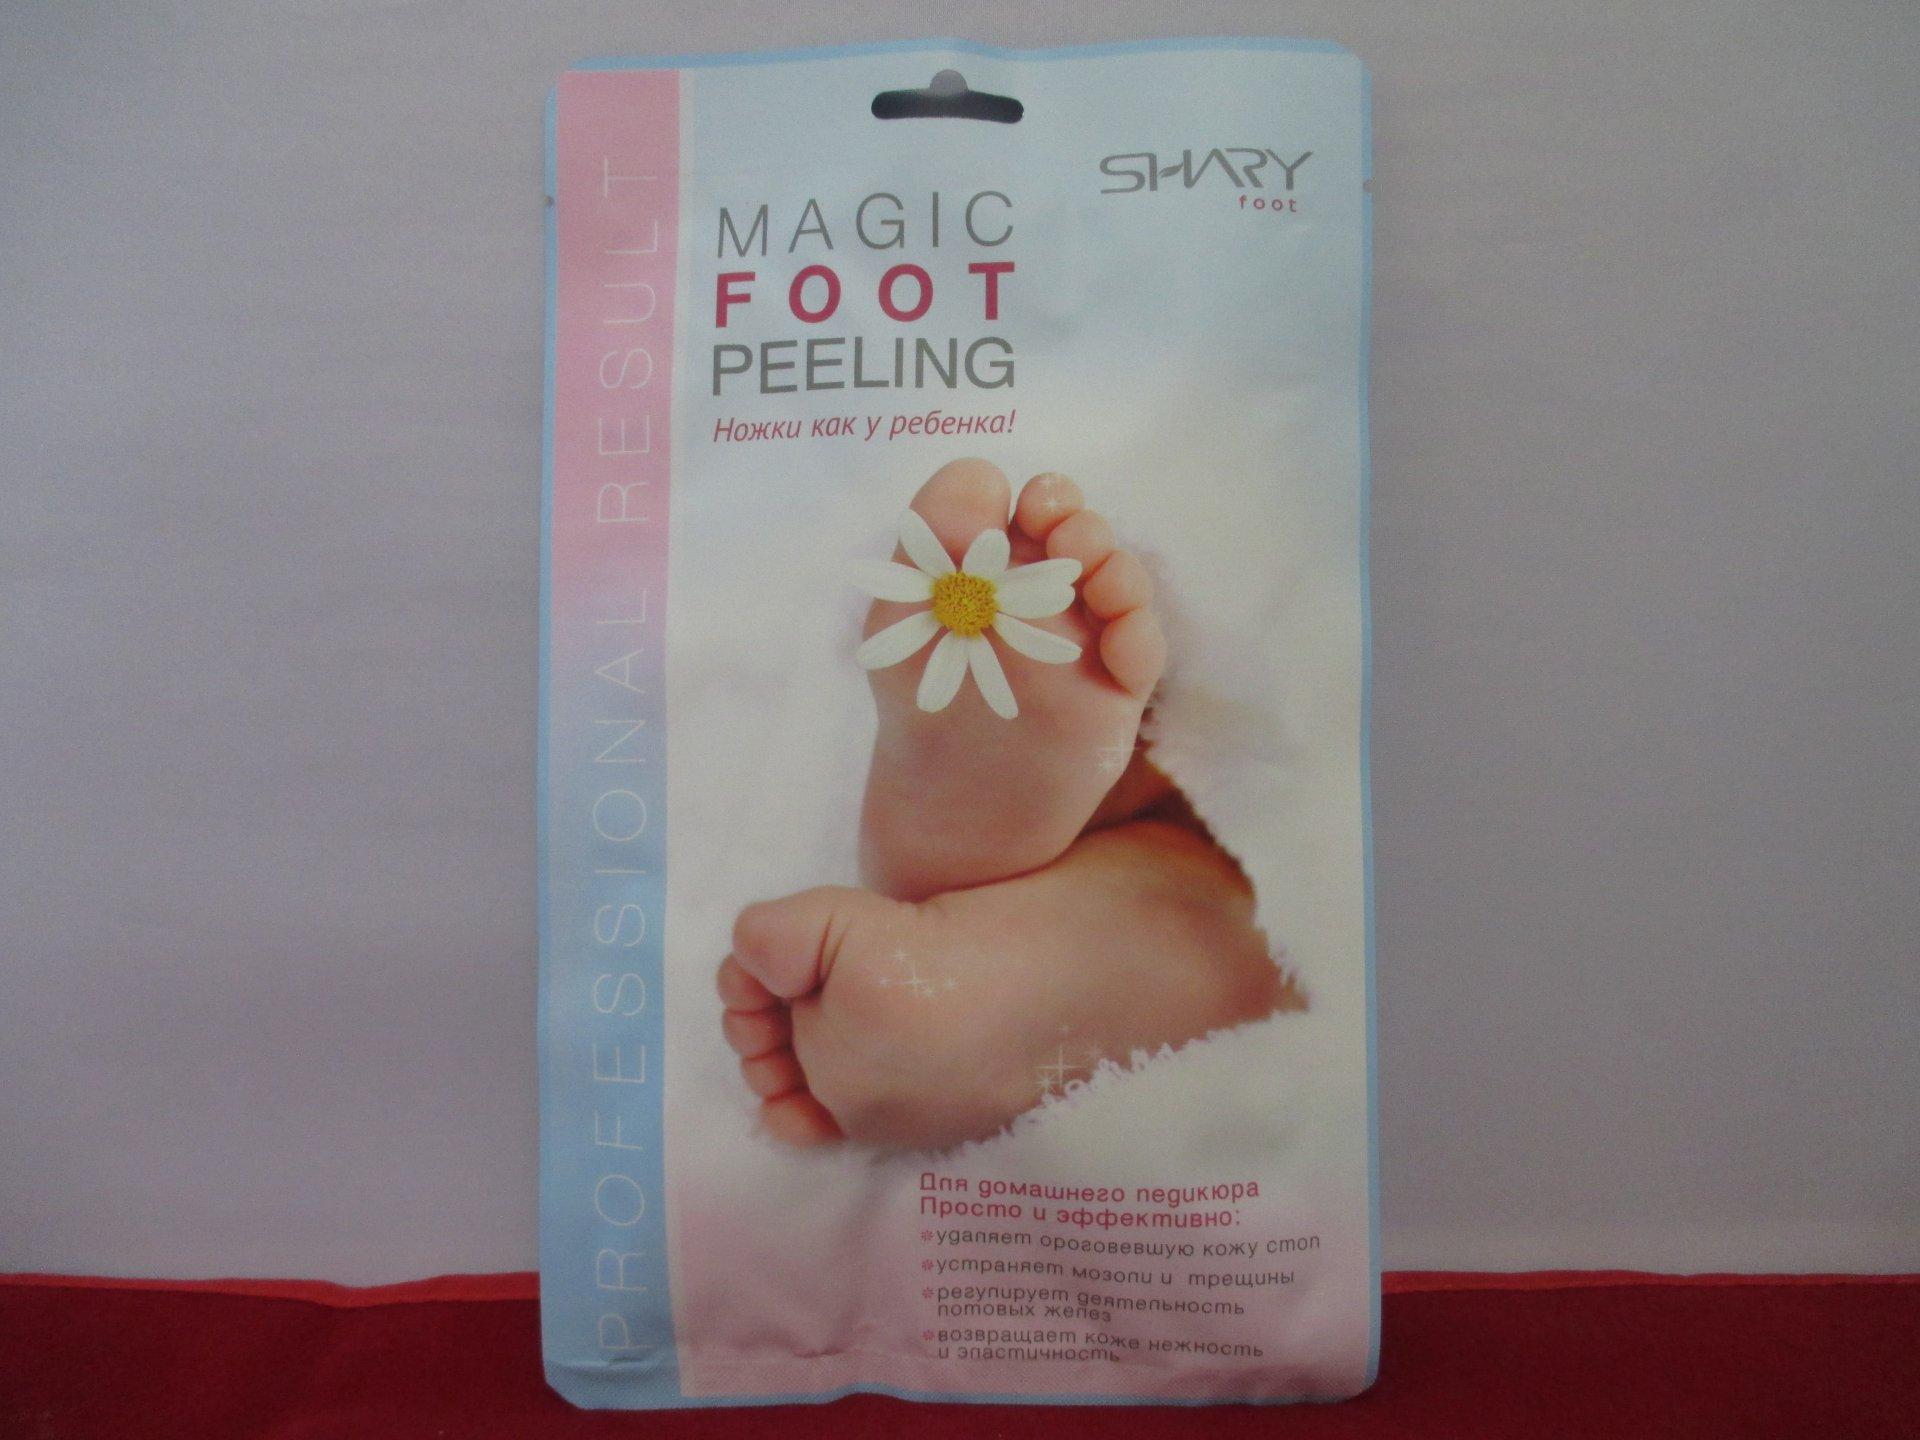 Носочки для домашнего педикюра shary foot magic foot peeling